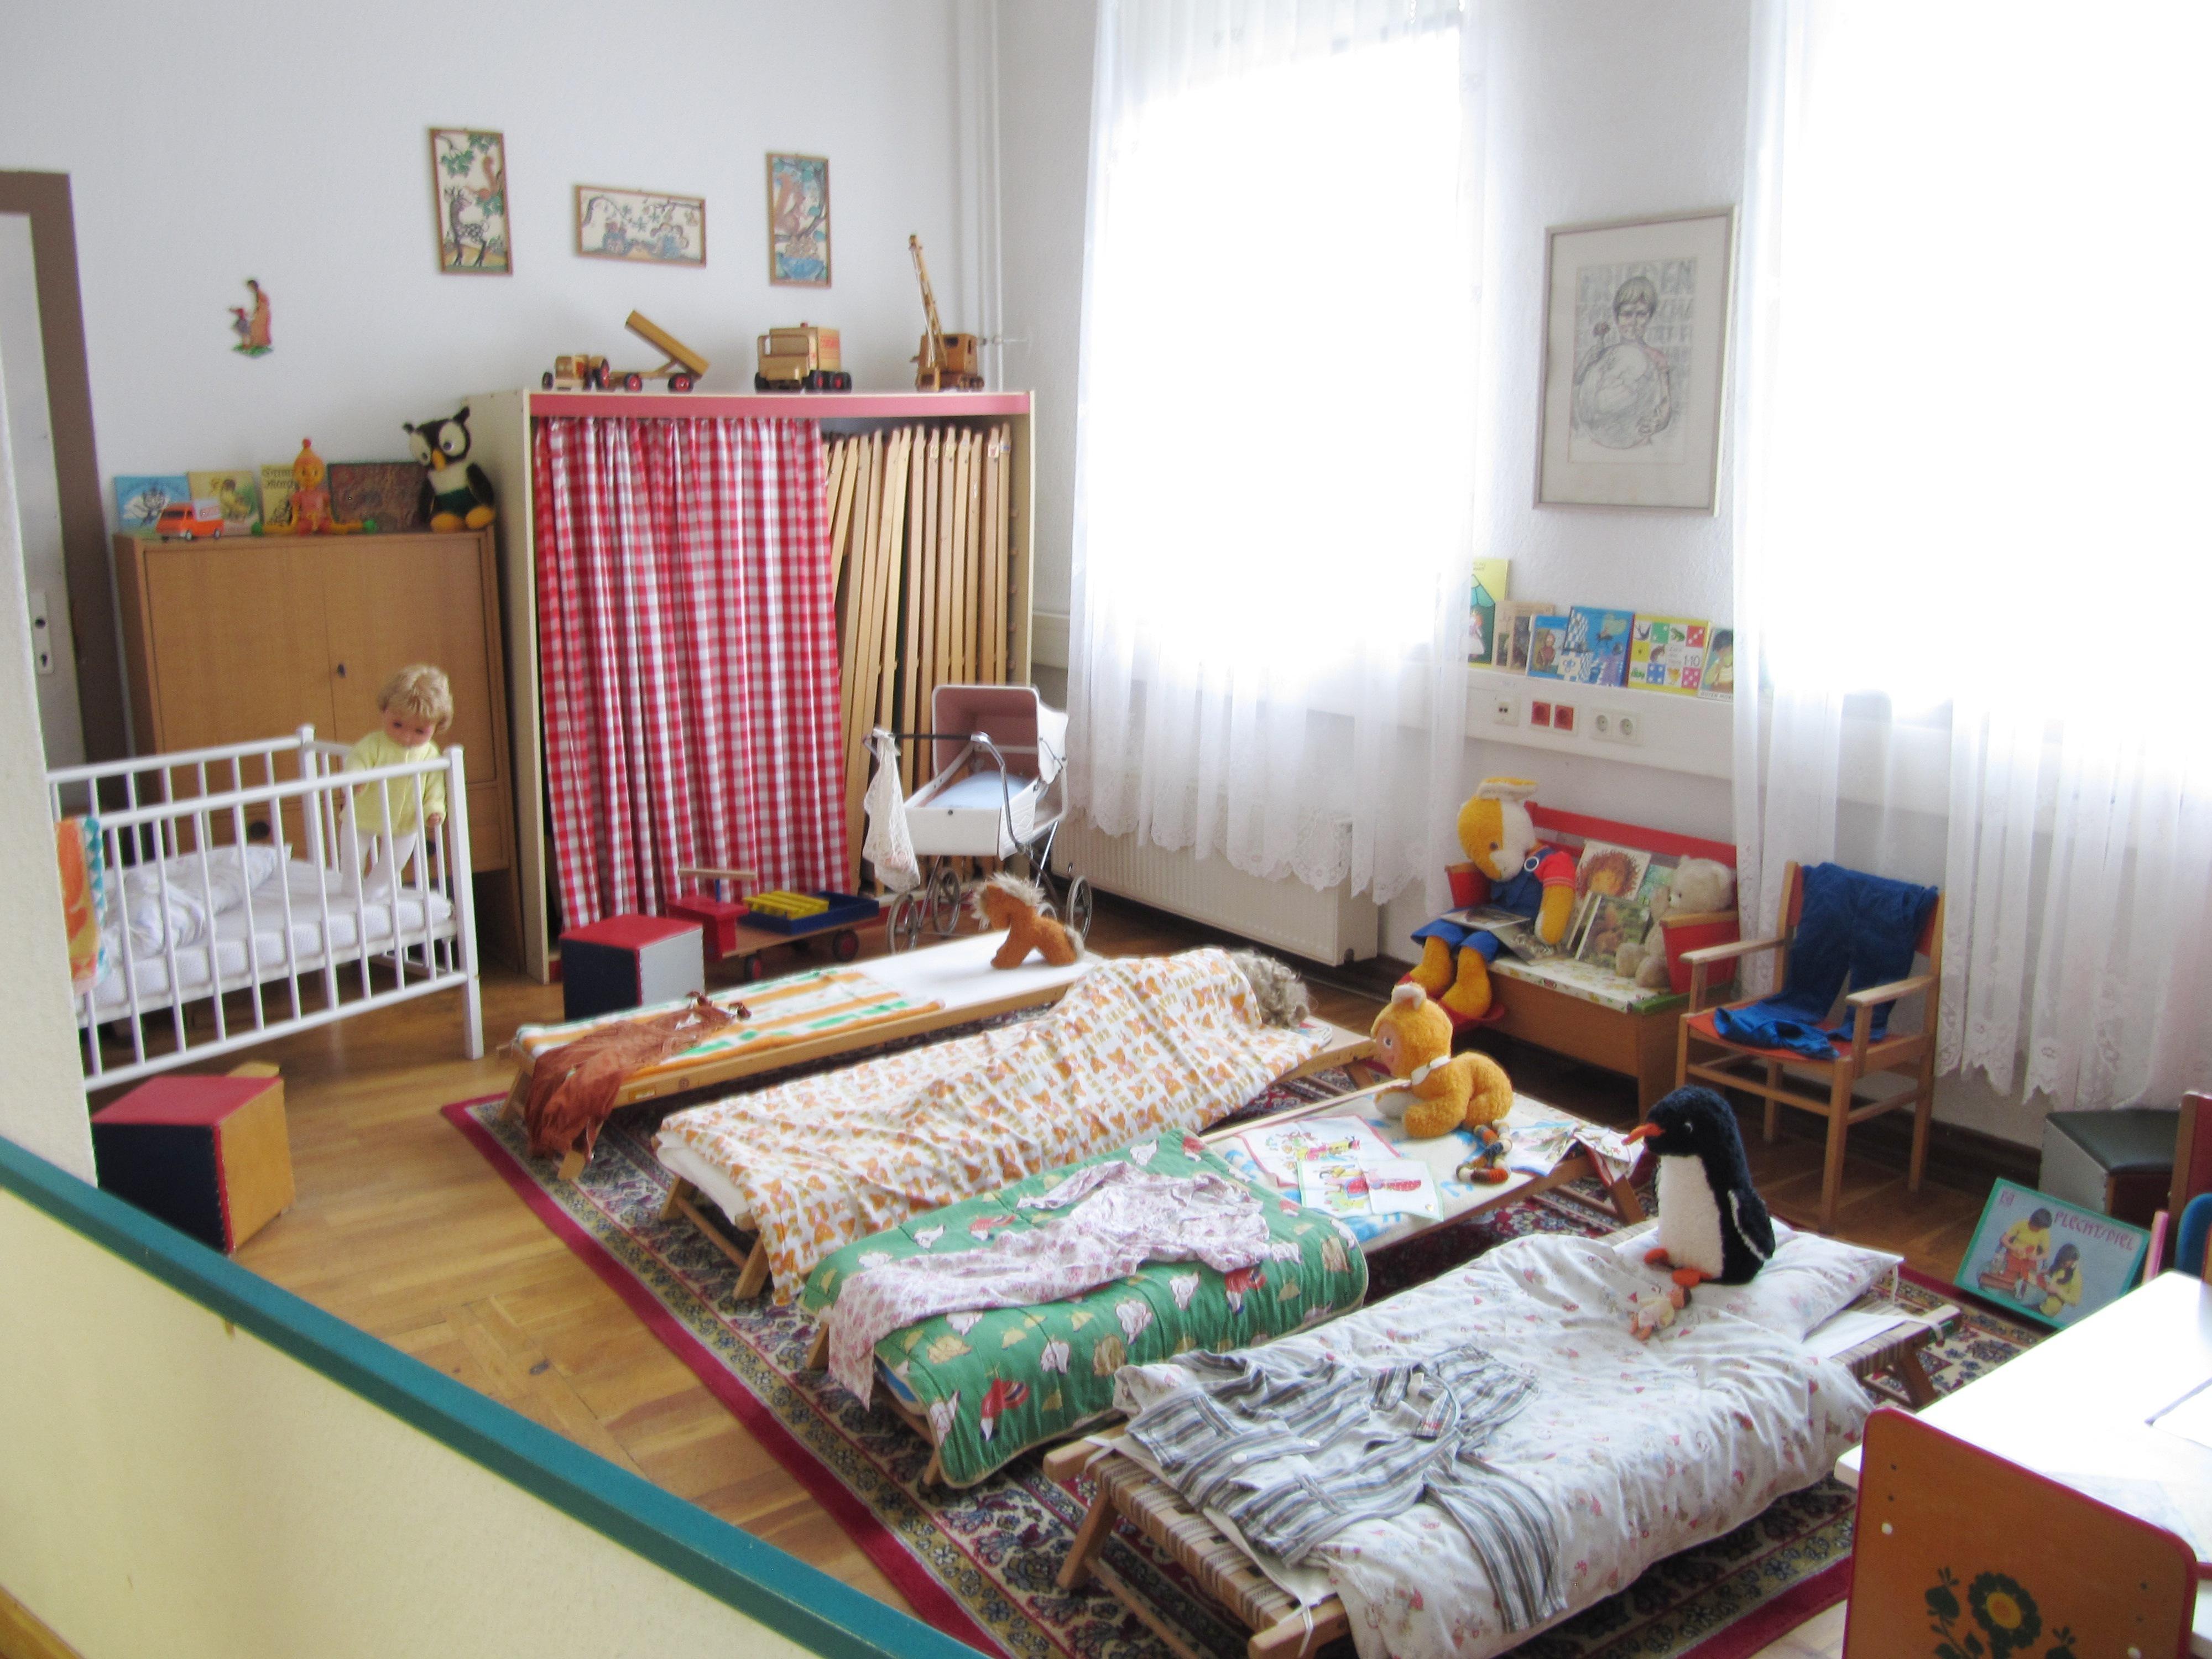 File Ddr Museum Pirna Kindergarten Schlafzimmer 2015 01 17 Jpg Wikimedia Commons